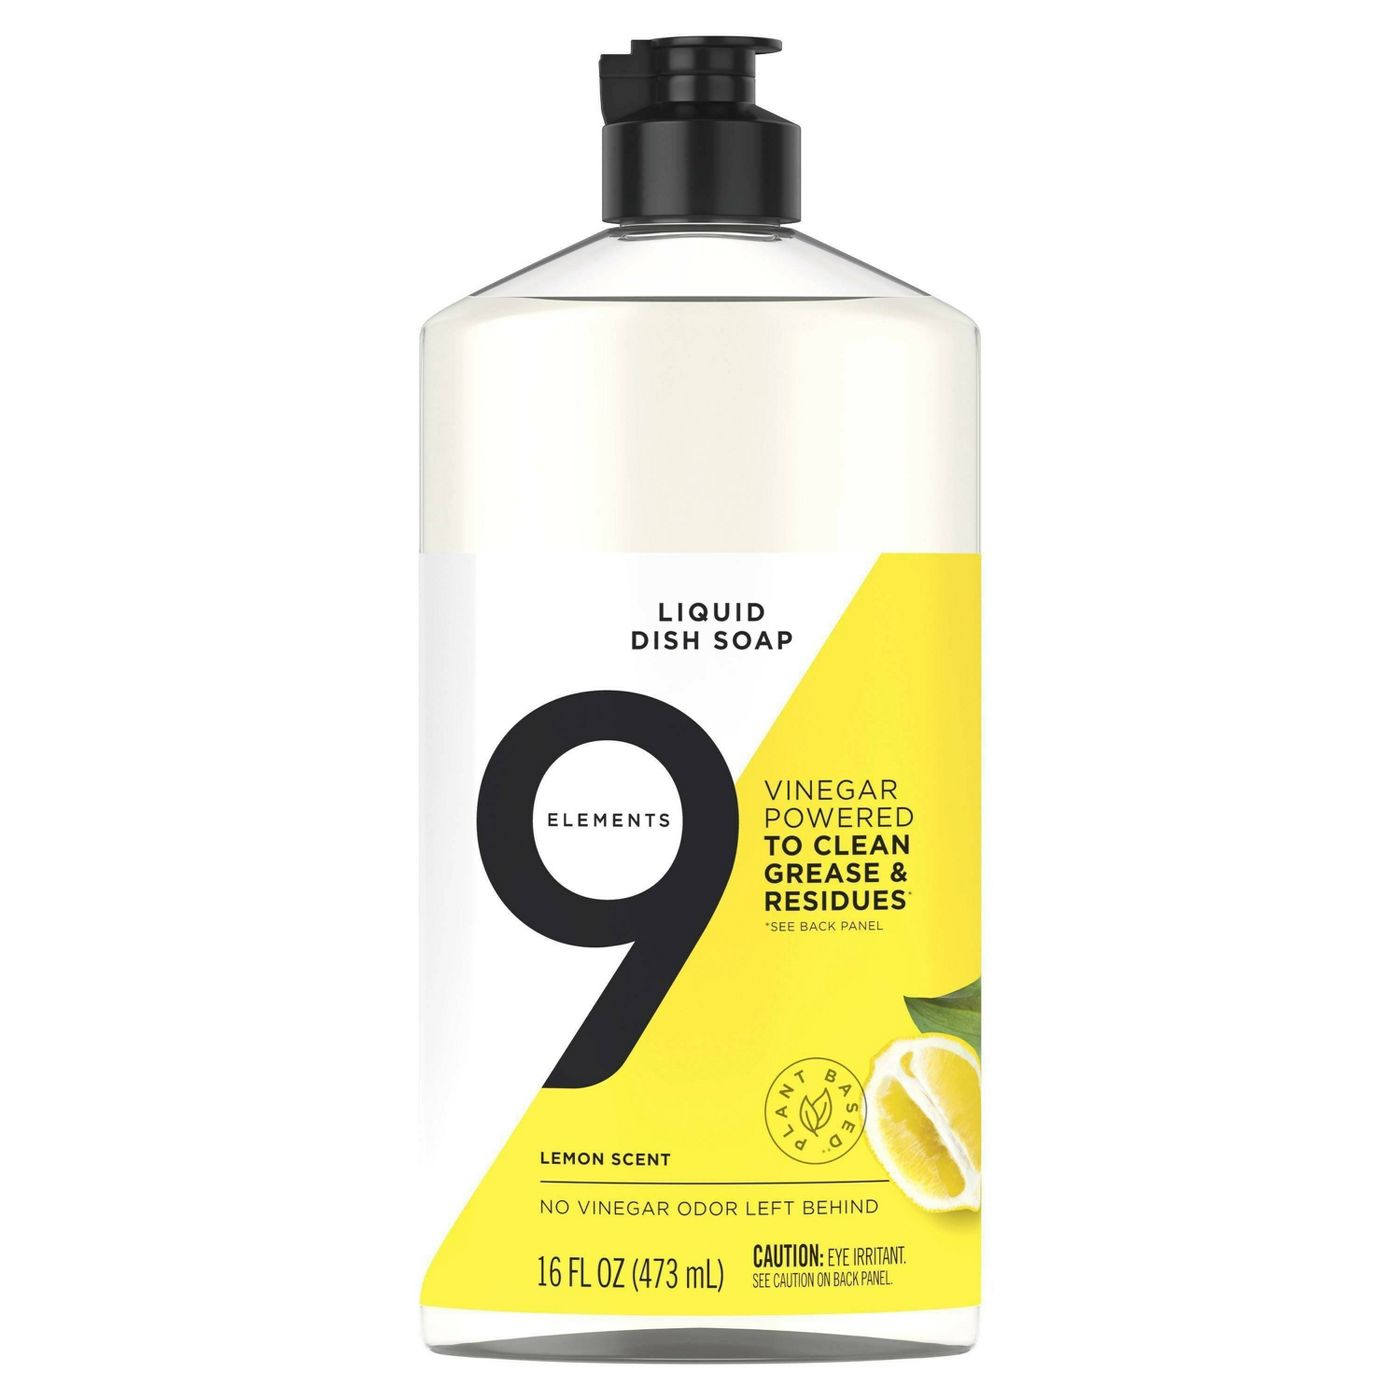 9 Elements Liquid Dish Soap – Lemon